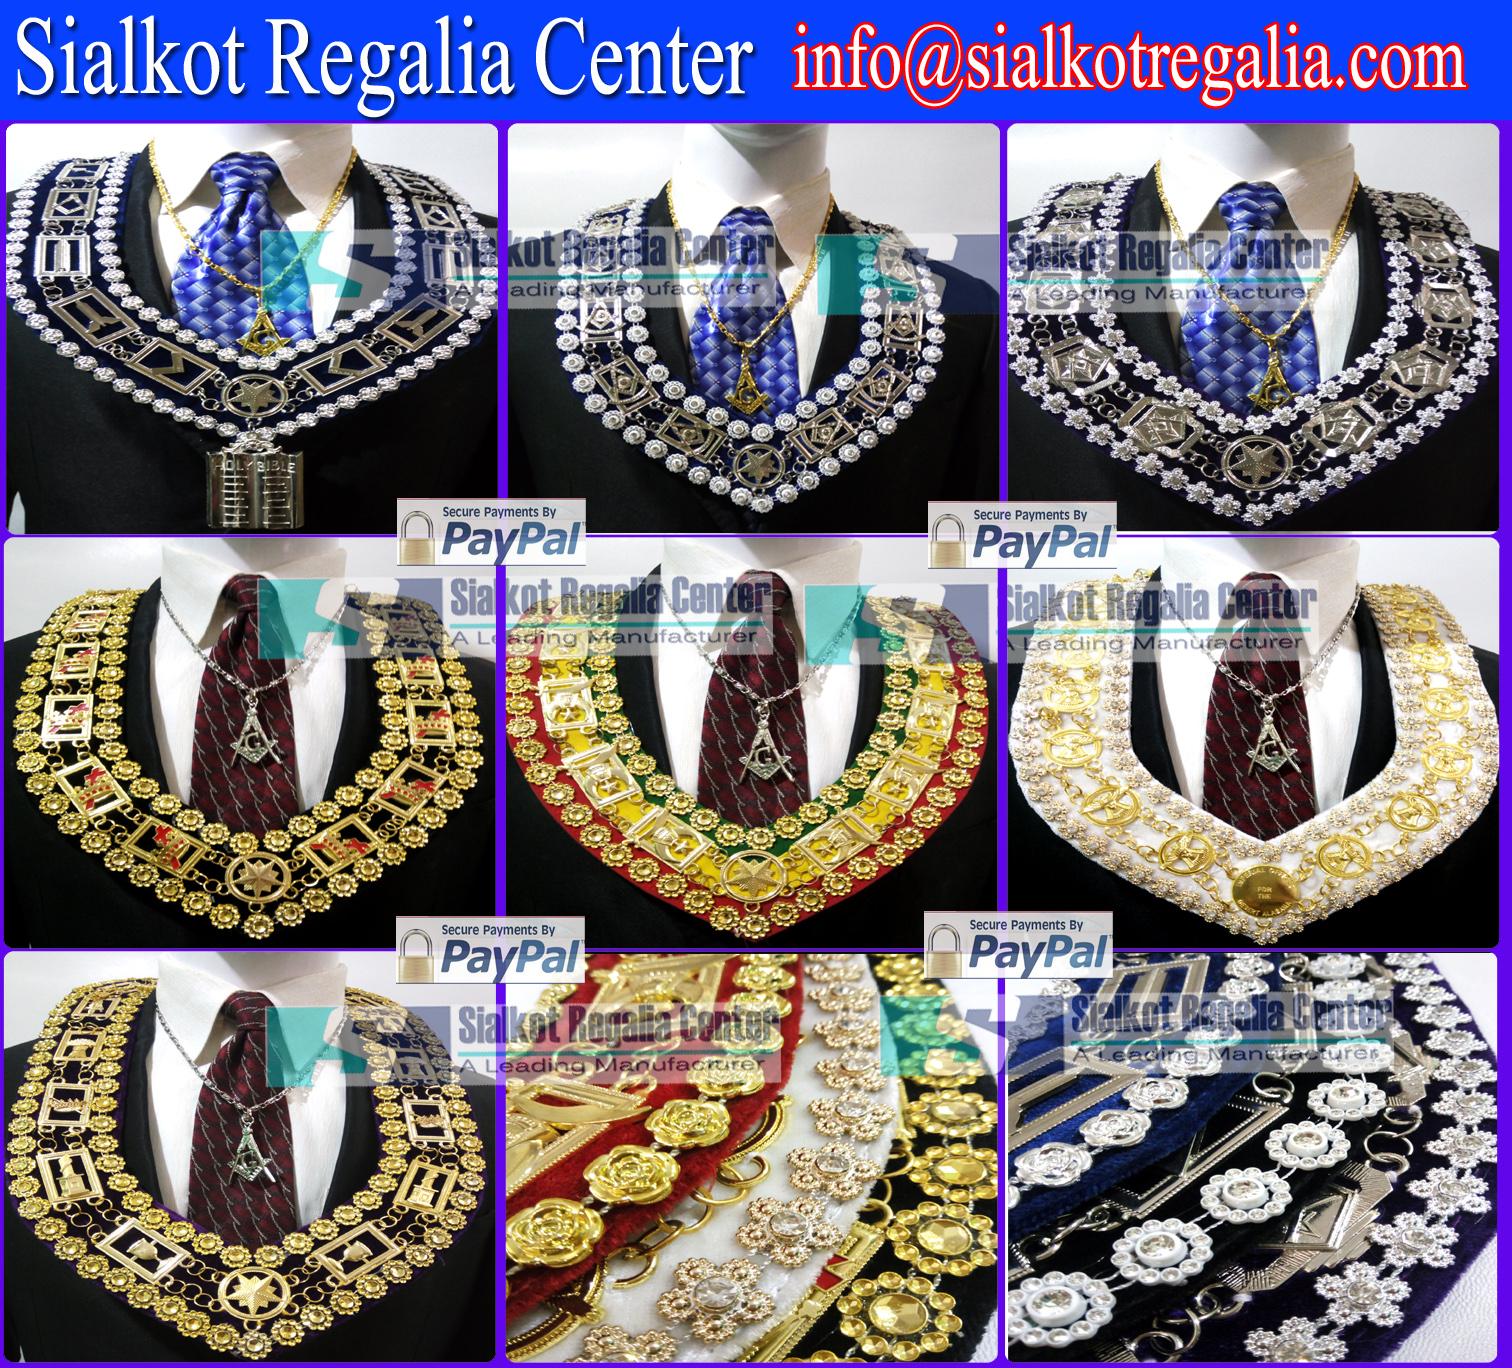 Sialkot Regalia Center : MASONIC REGALIA BLUE HOUSE METAL